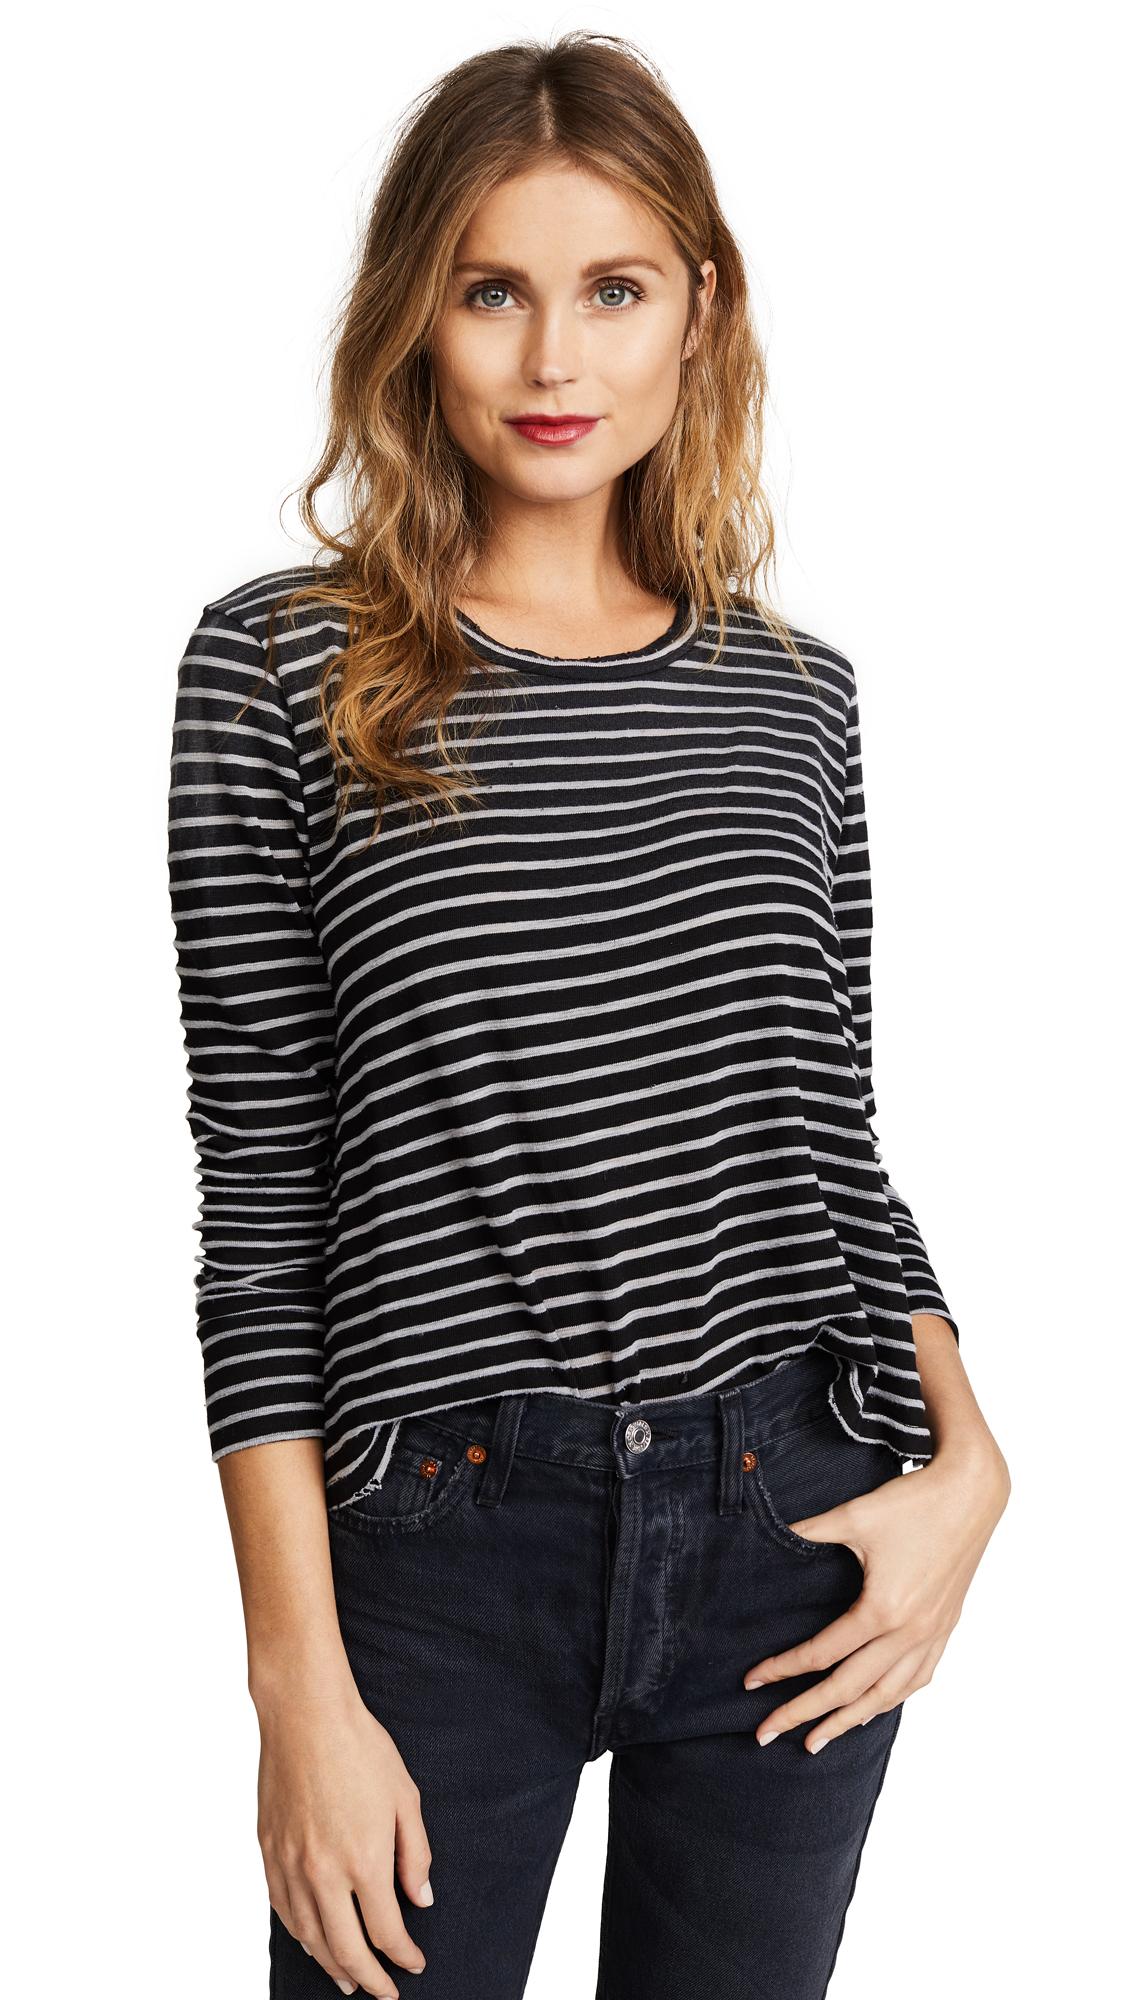 LNA Faded Stripe Long Sleeve Tee In Black/White Stripe